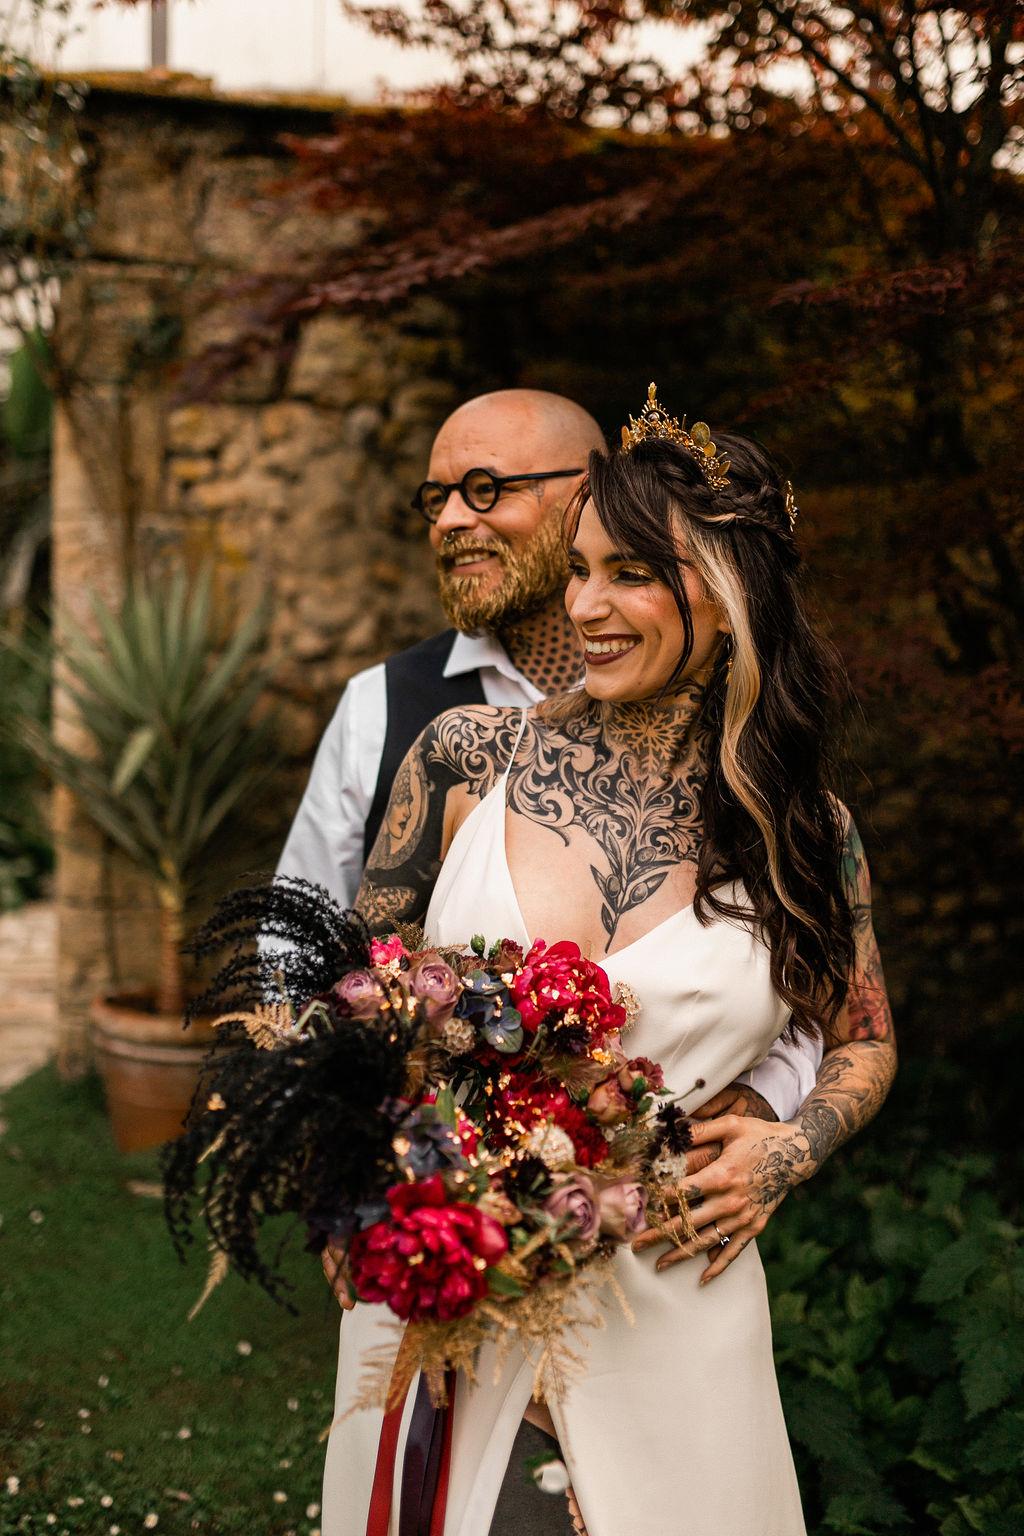 tattooed bride and groom - alternative wedding style - alternative wedding bouquet